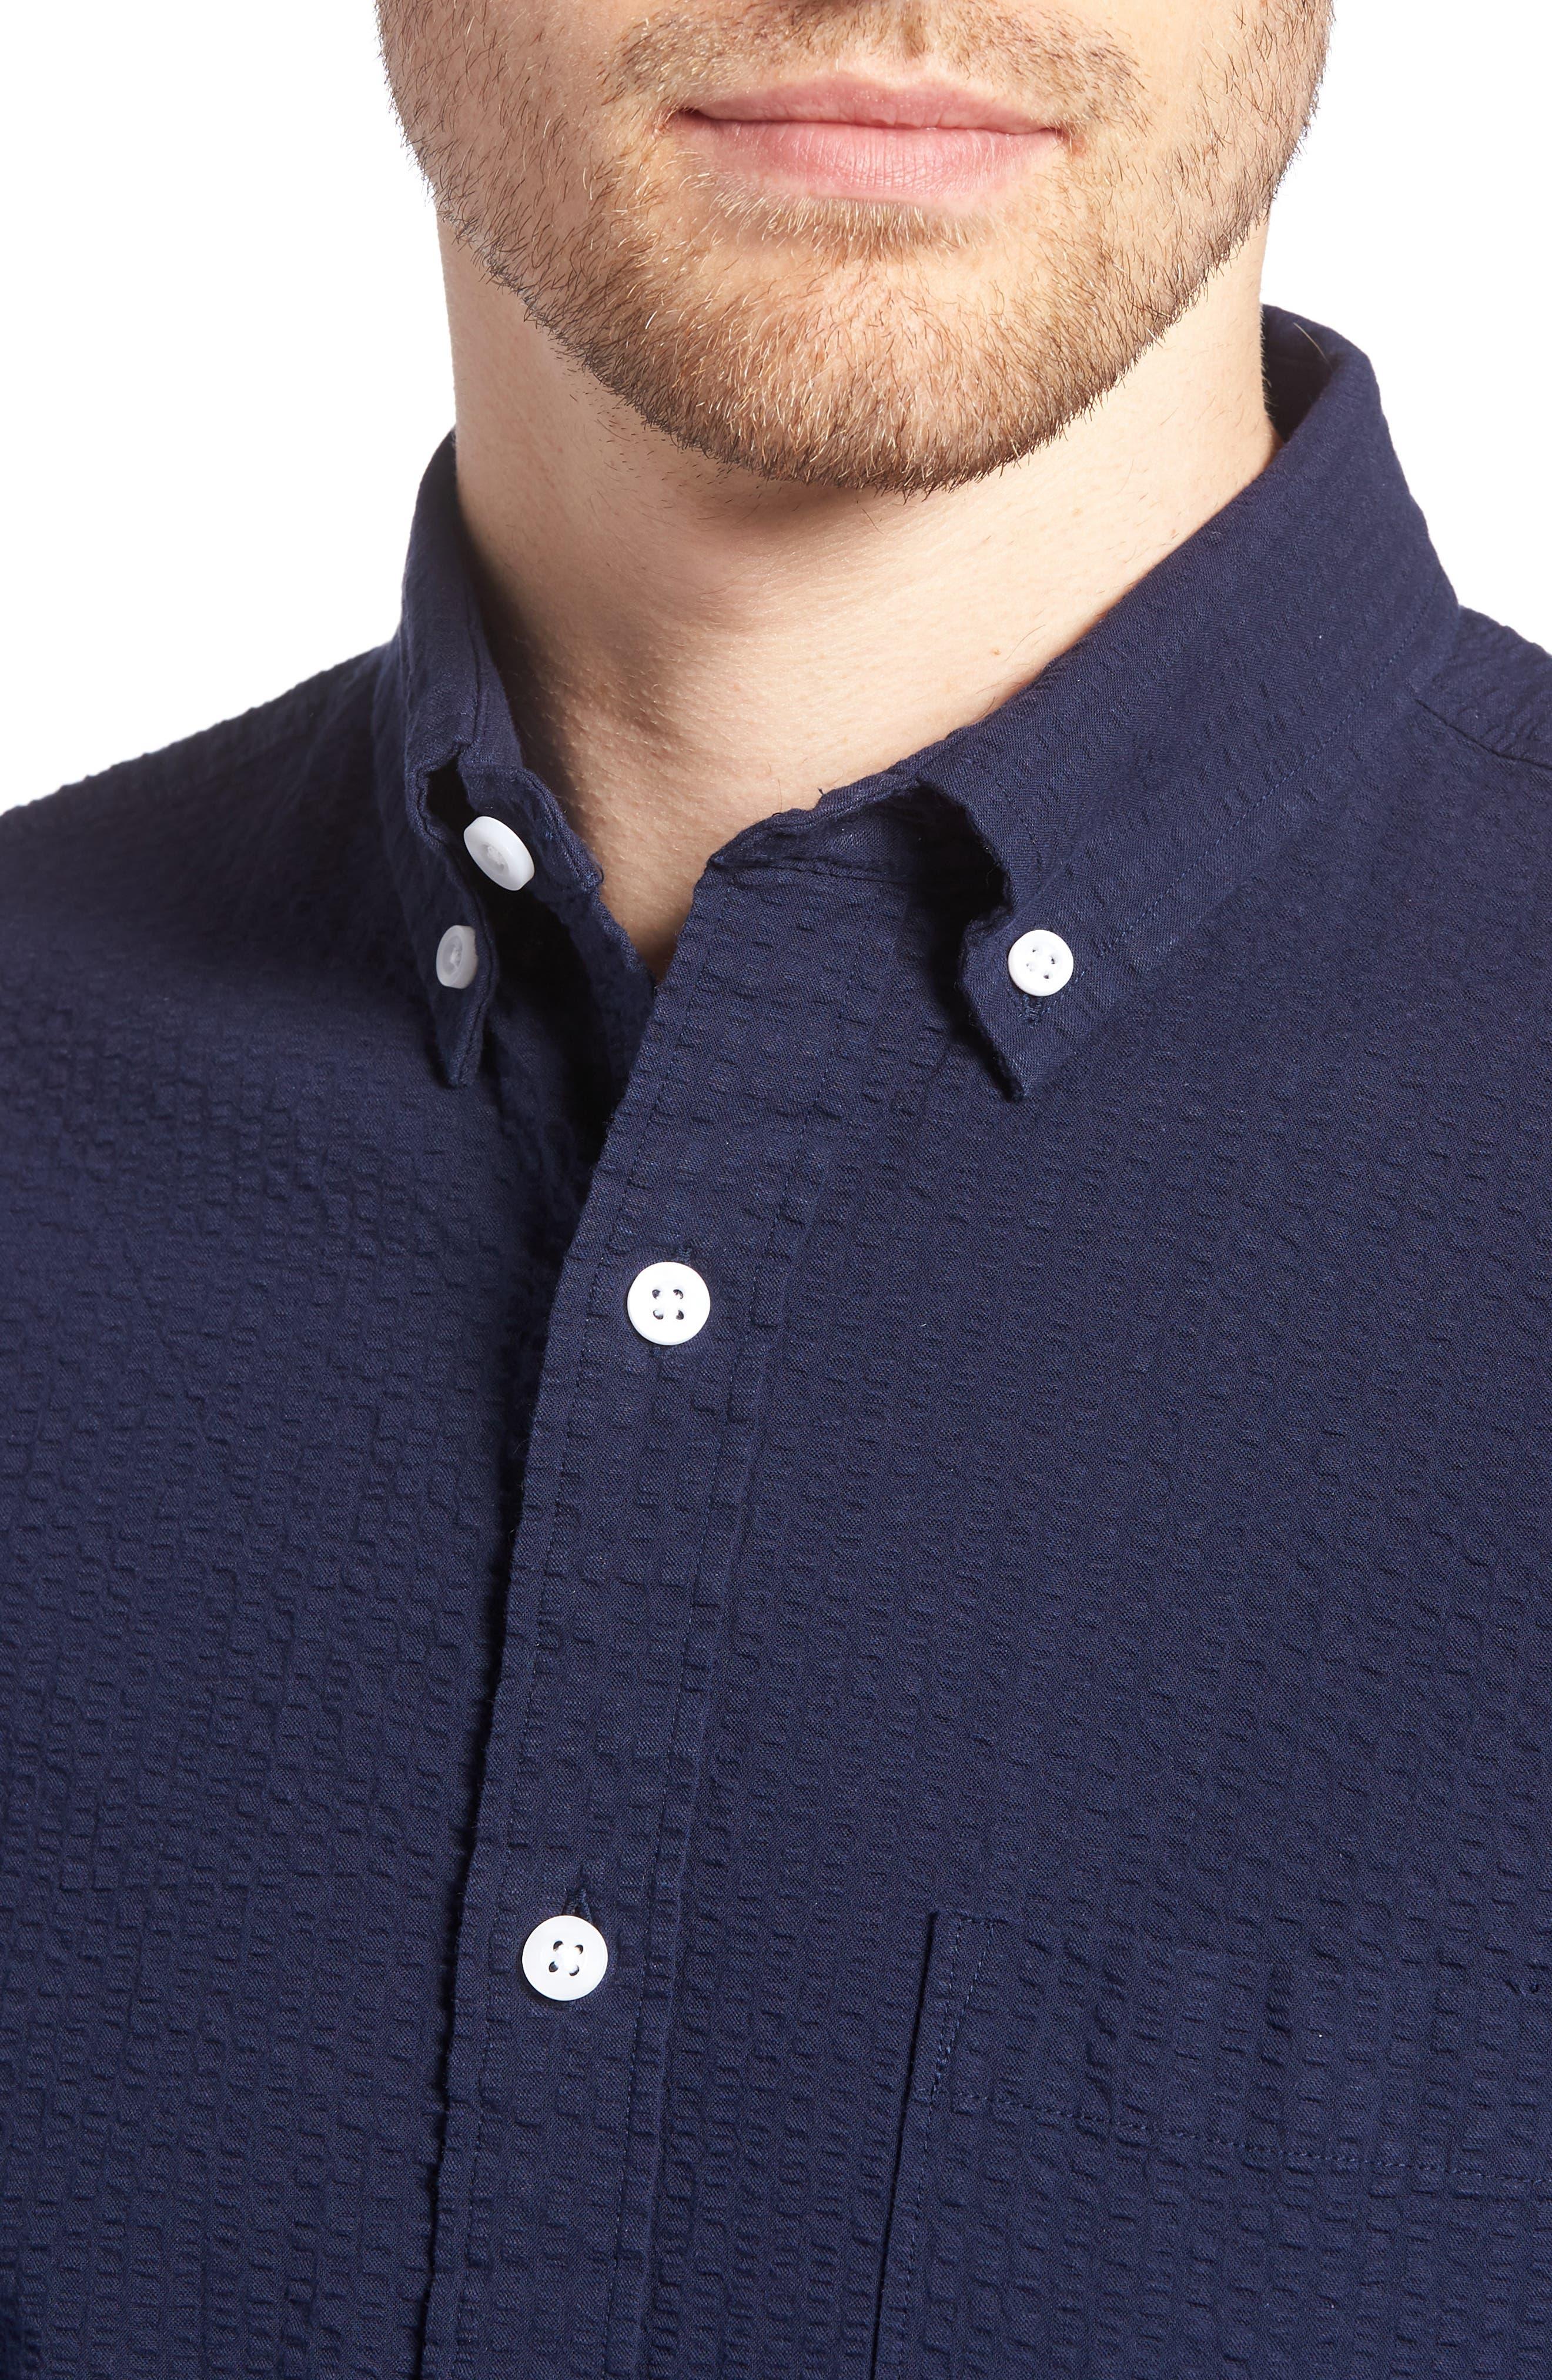 Trim Fit Seersucker Sport Shirt,                             Alternate thumbnail 2, color,                             Navy Iris Seersucker